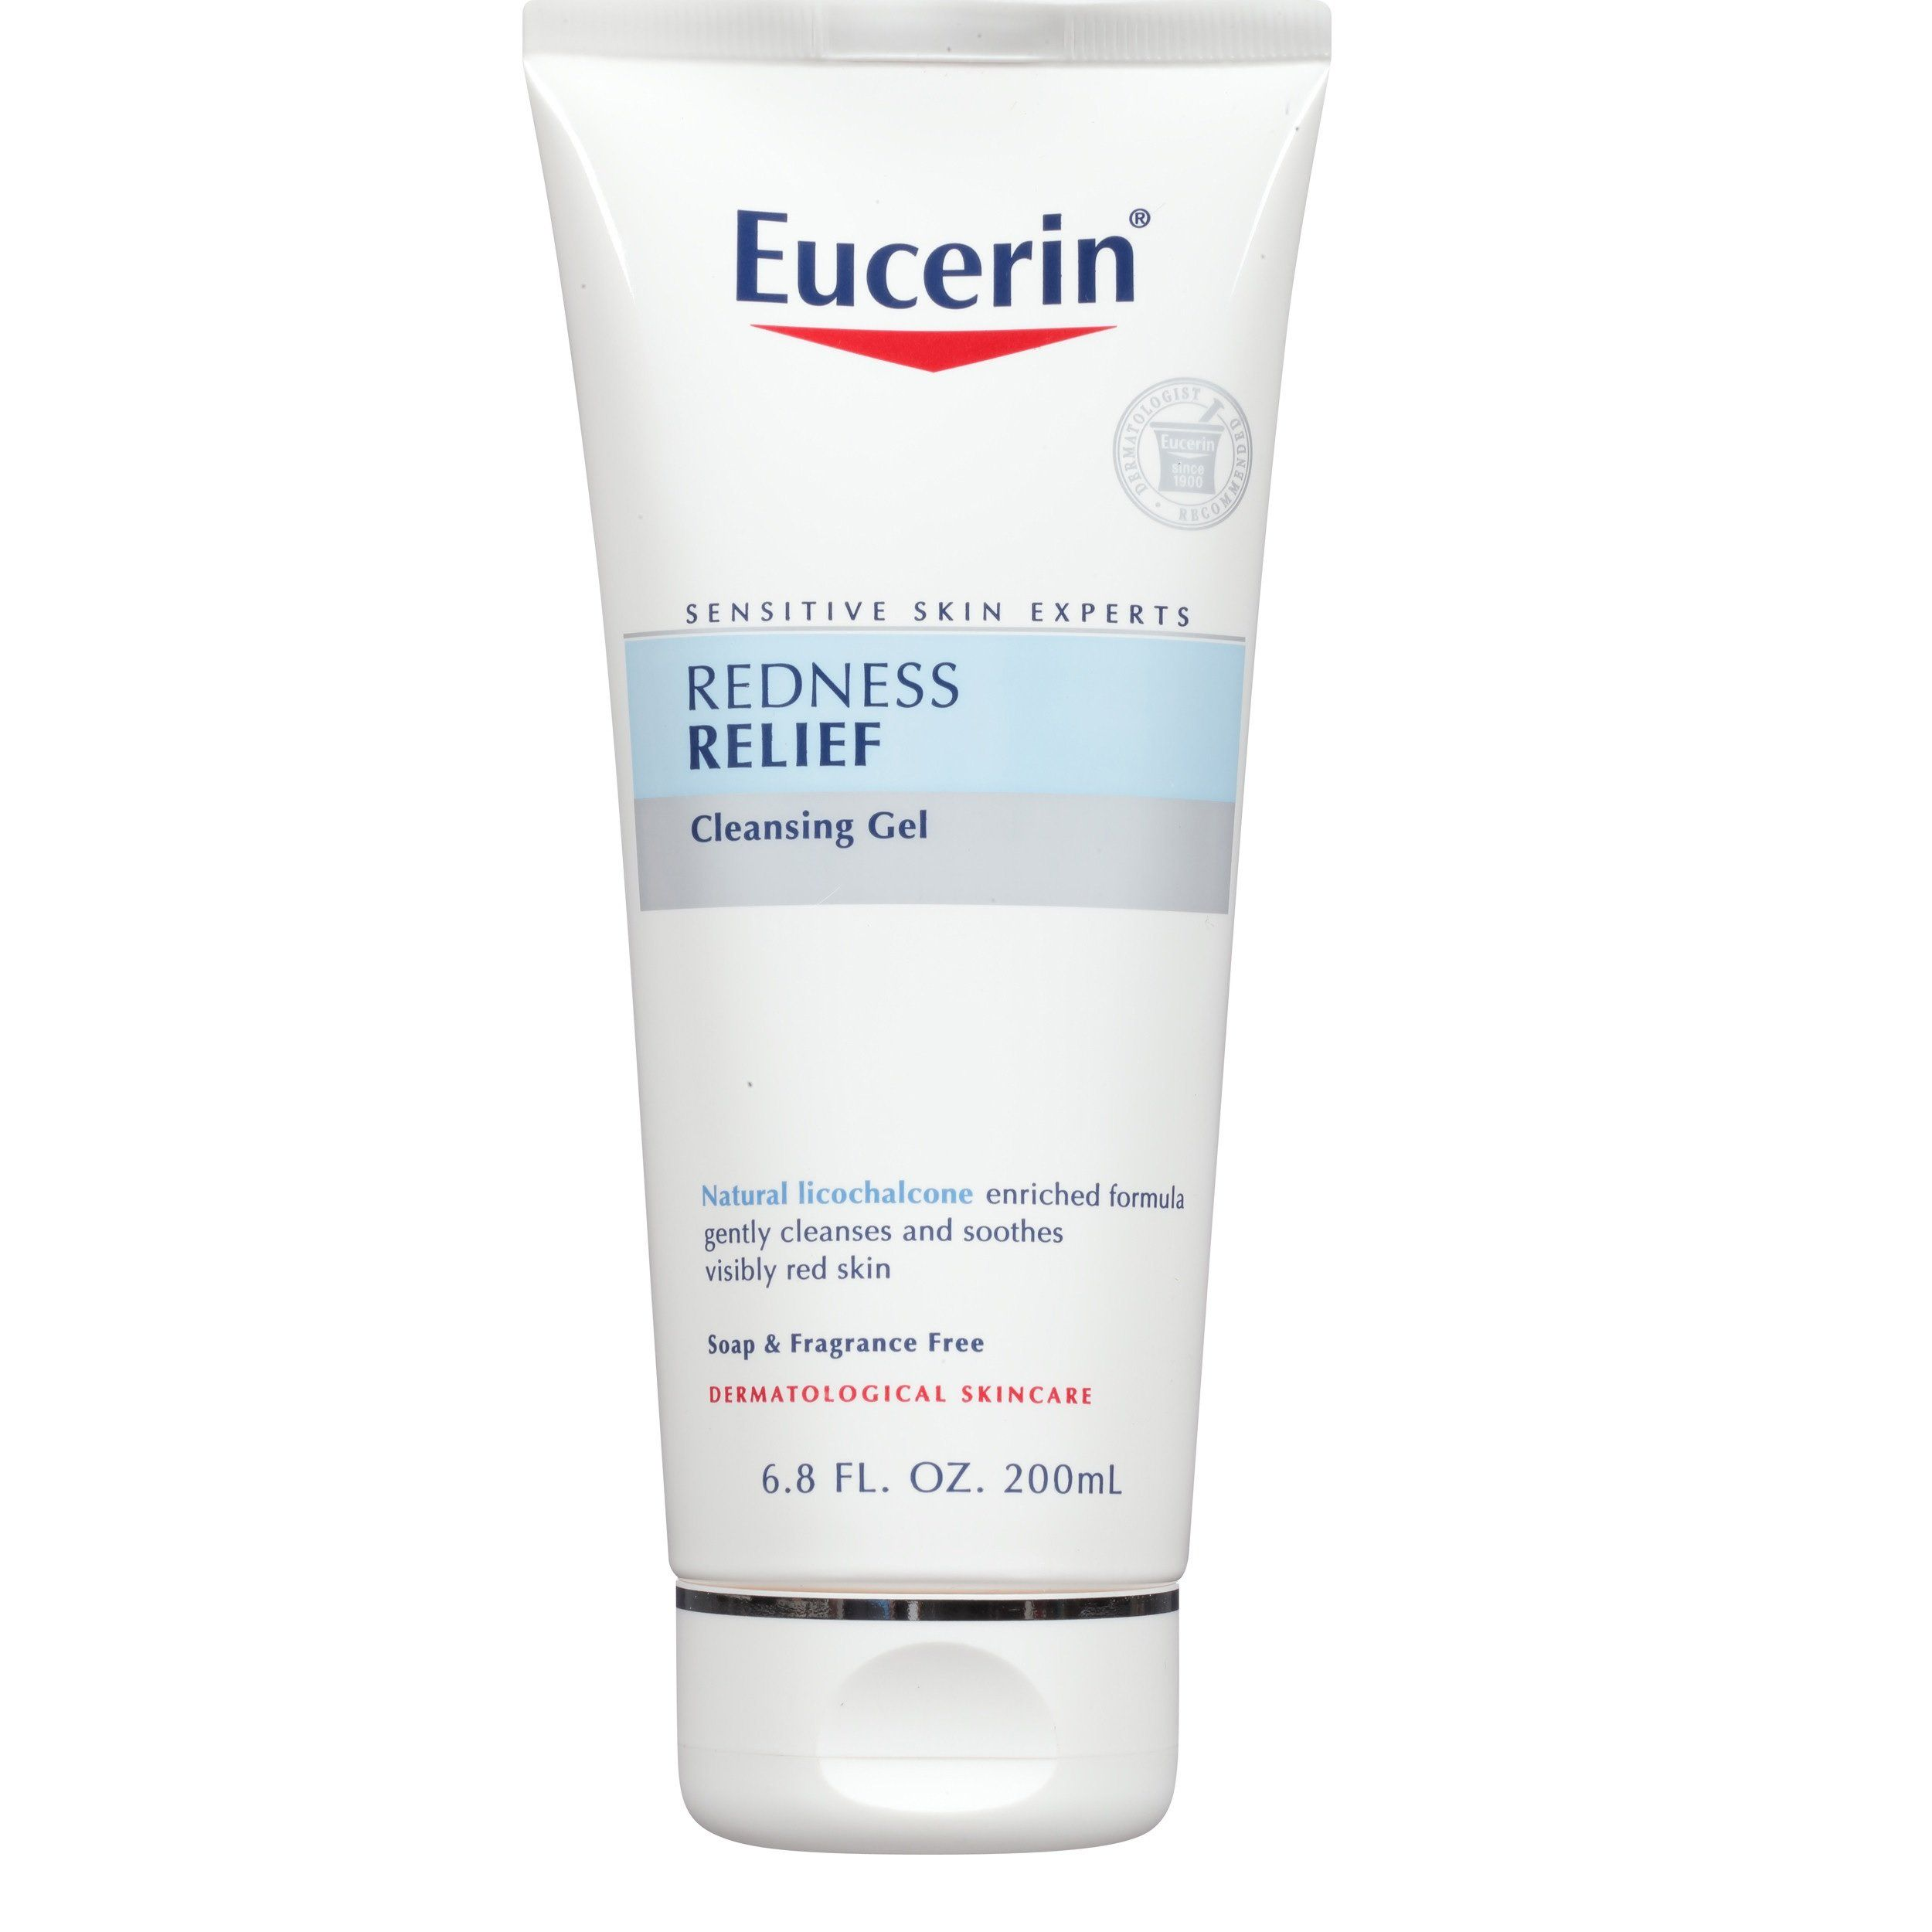 Eucerin Sensitive Skin Redness Relief Cleansing Gel 6 8 Ounce Gentle Soap Free Gel Removes Makeup An Combination Skin Face Wash Combination Skin Skin Redness